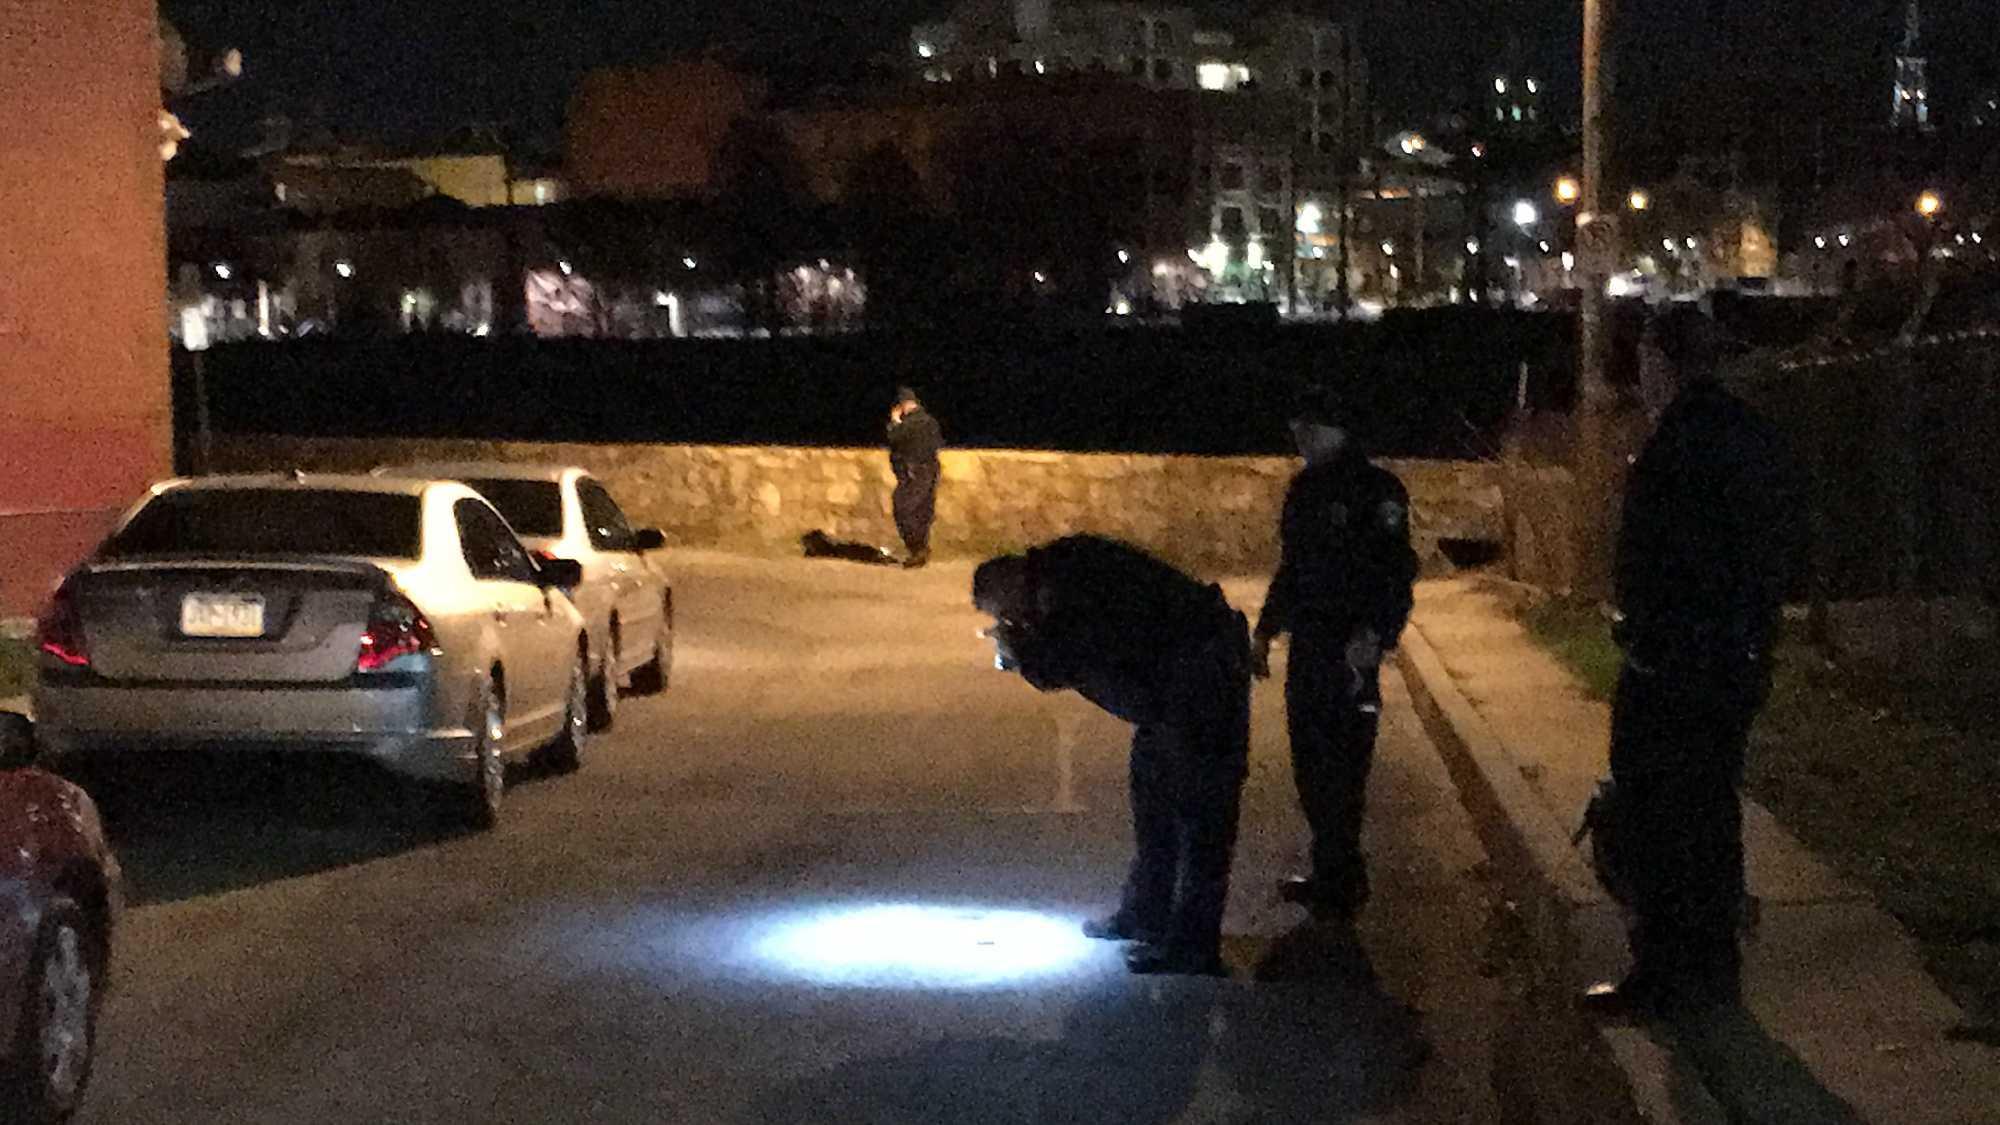 Police investigating shooting in York